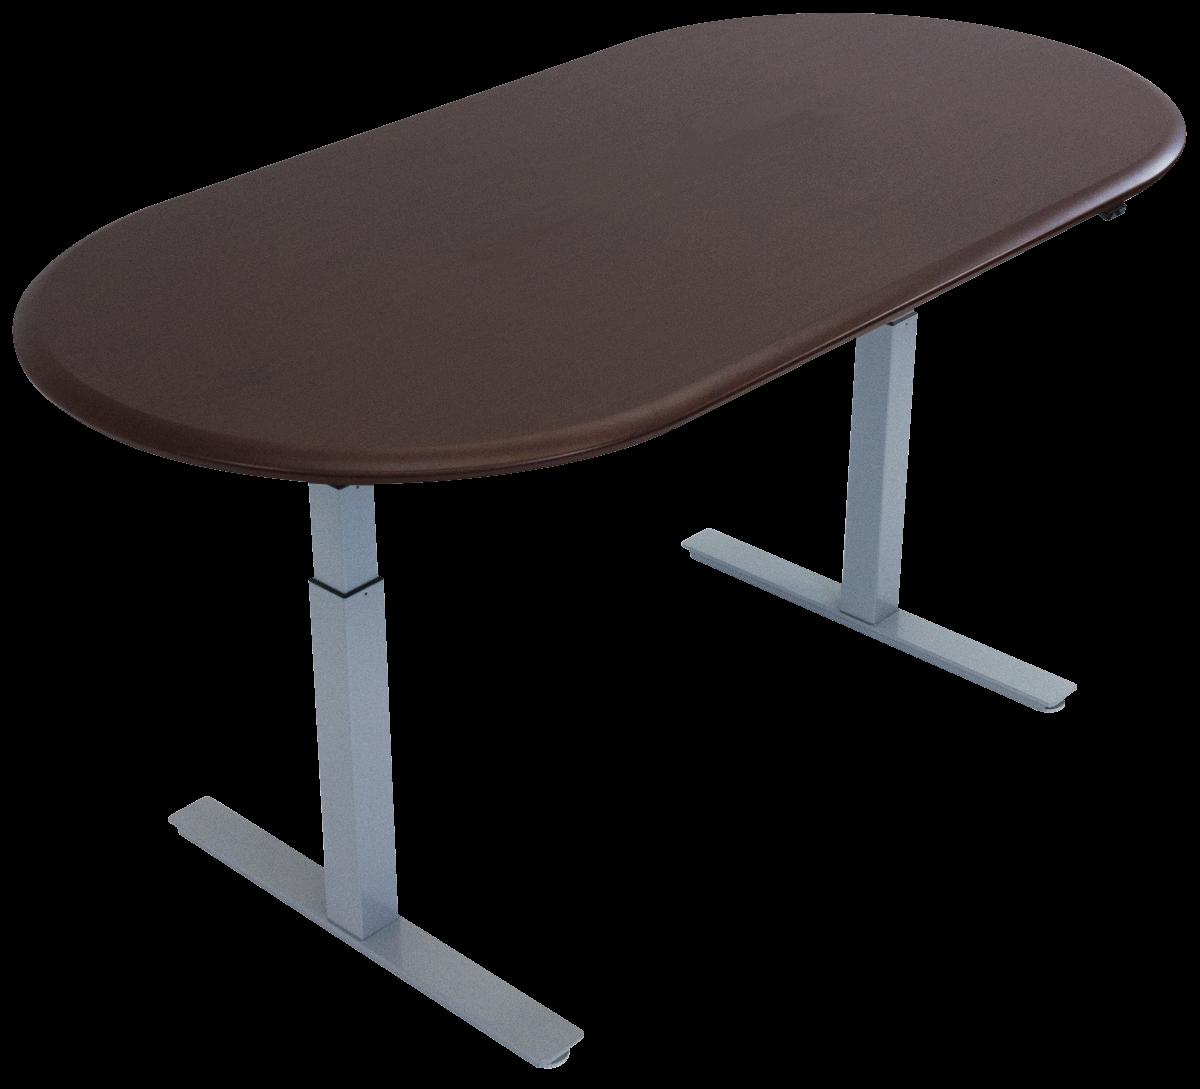 iMovR Synapse Adjustable-Height Multi-Purpose Table - Racetrack